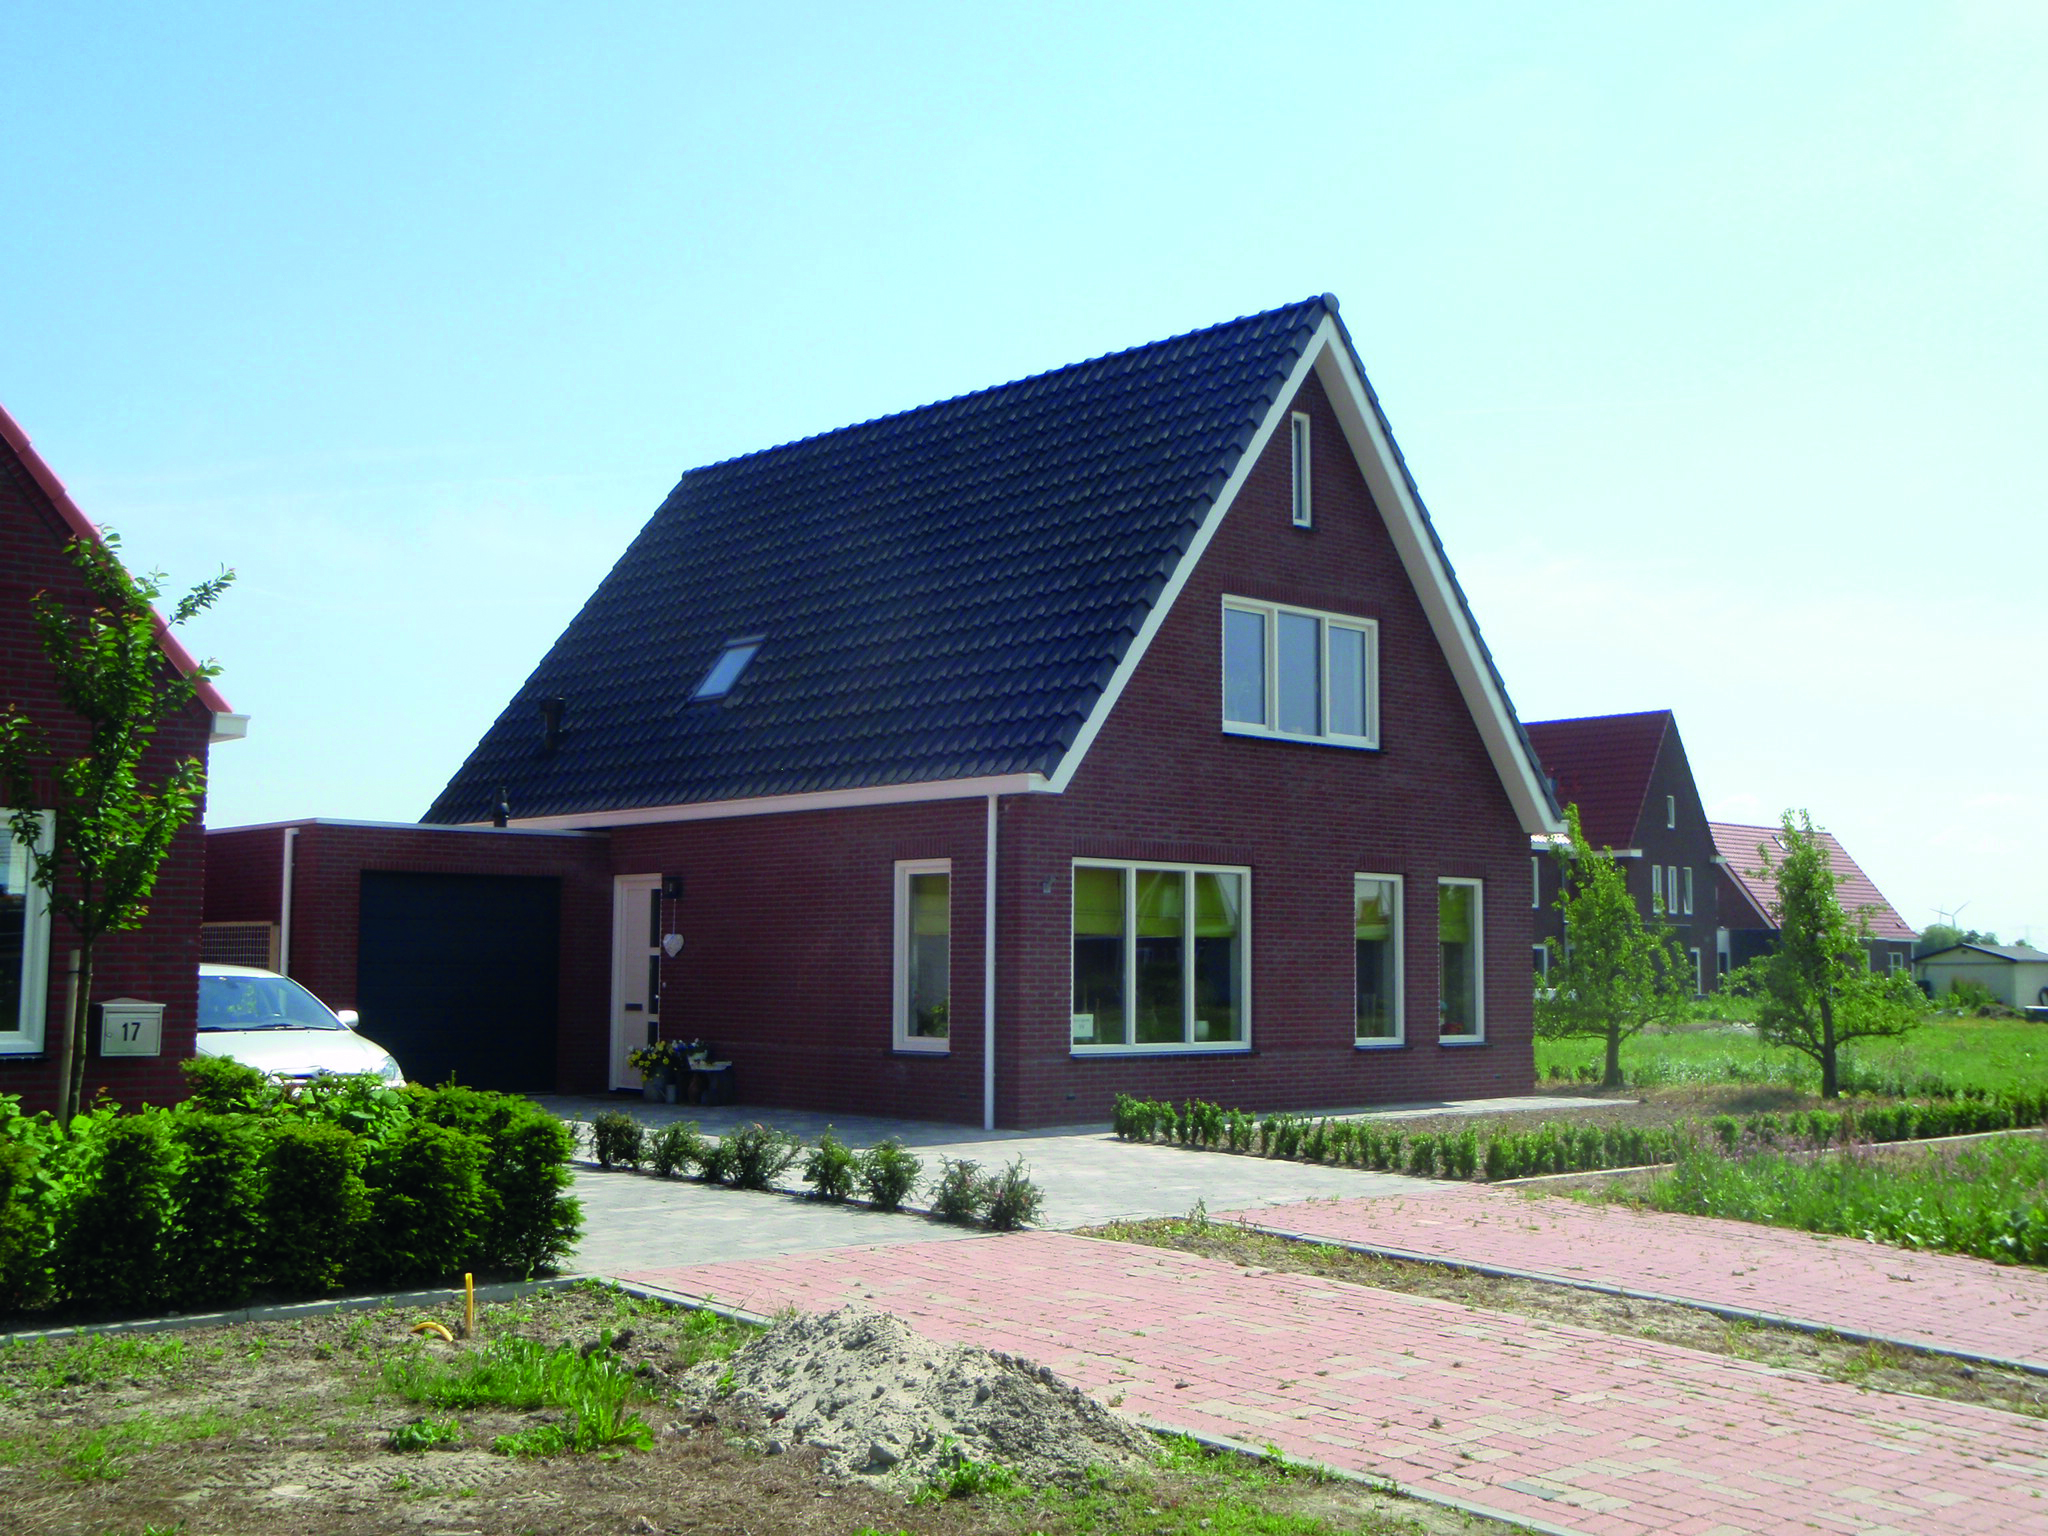 Medium, Jipen Janneke Kapelle, Dijkwel.jpg